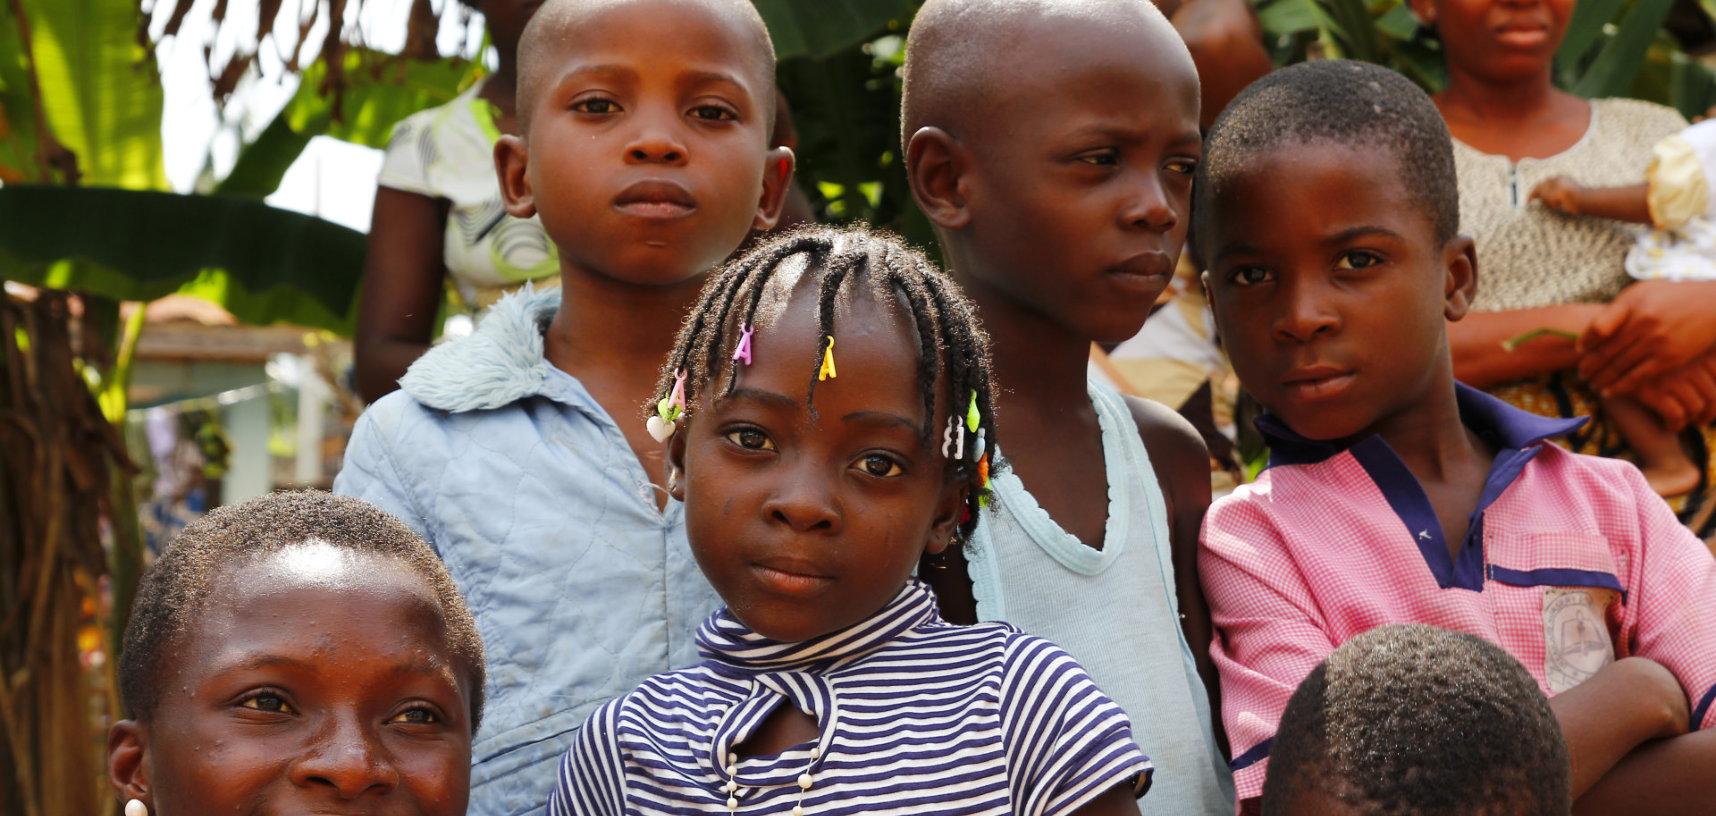 Nigerian boys and girls